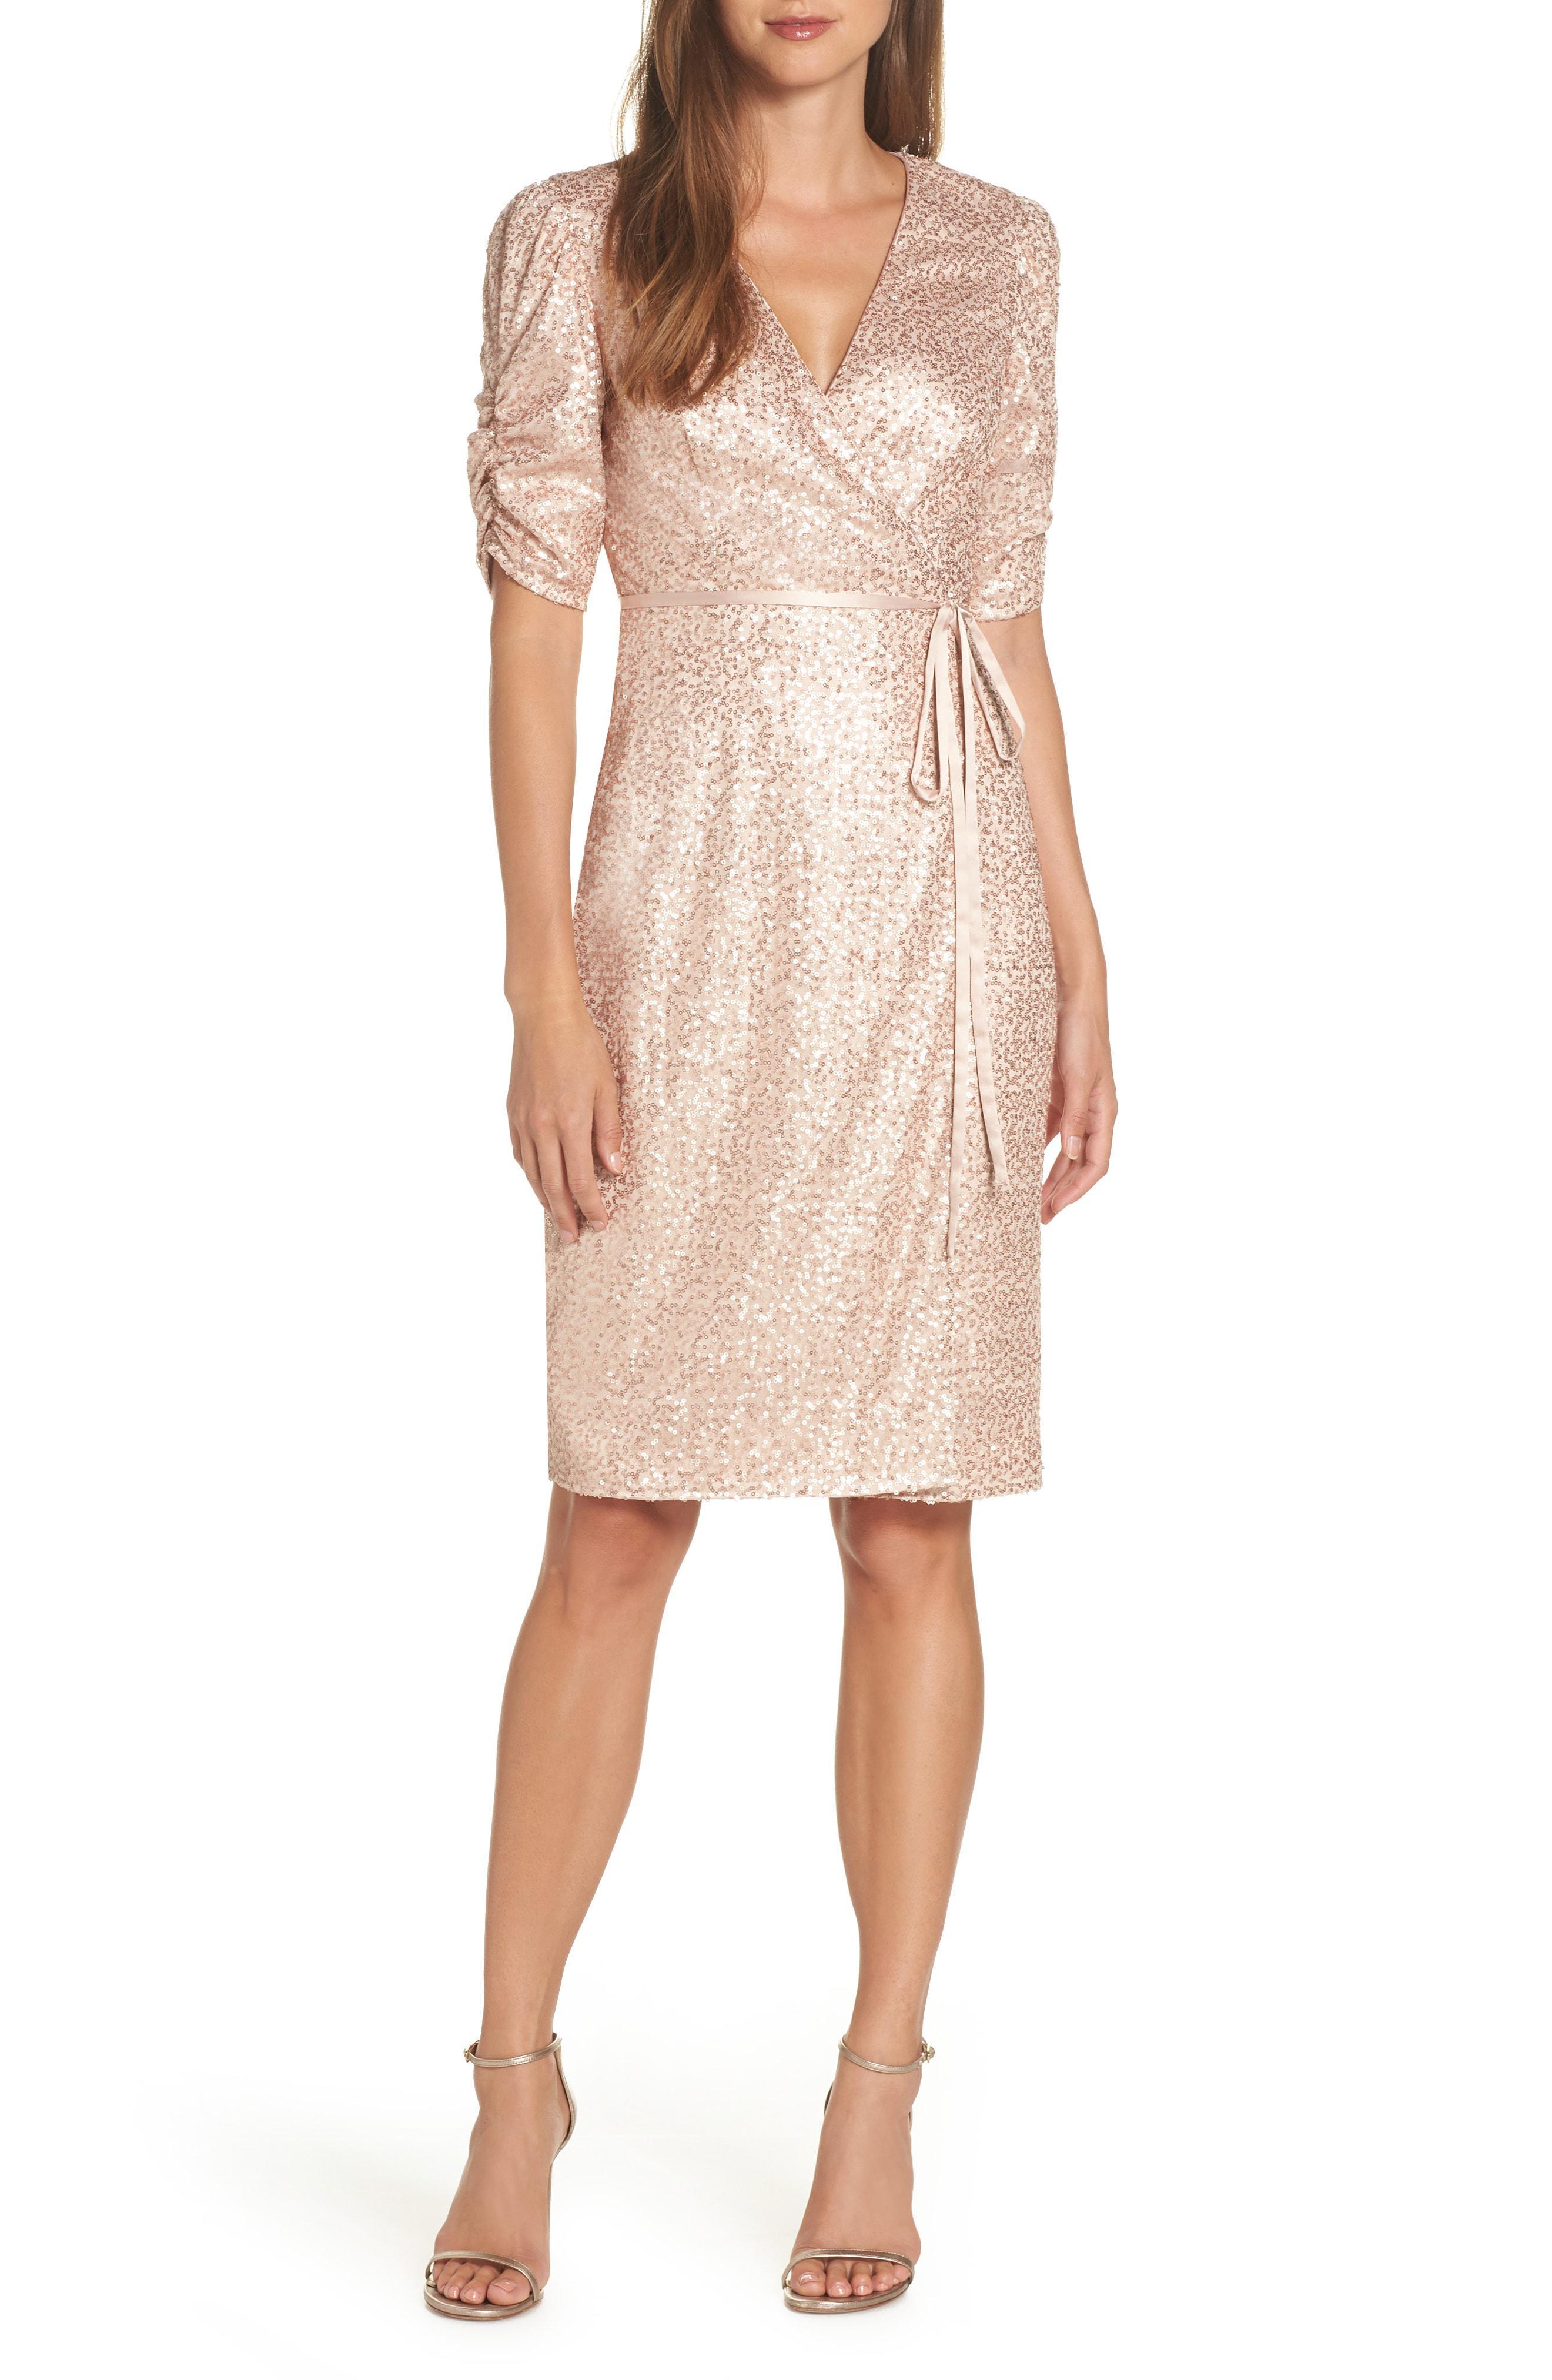 df0f9323aa1 Lyst - Eliza J Sequin Faux Wrap Dress - Save 40%